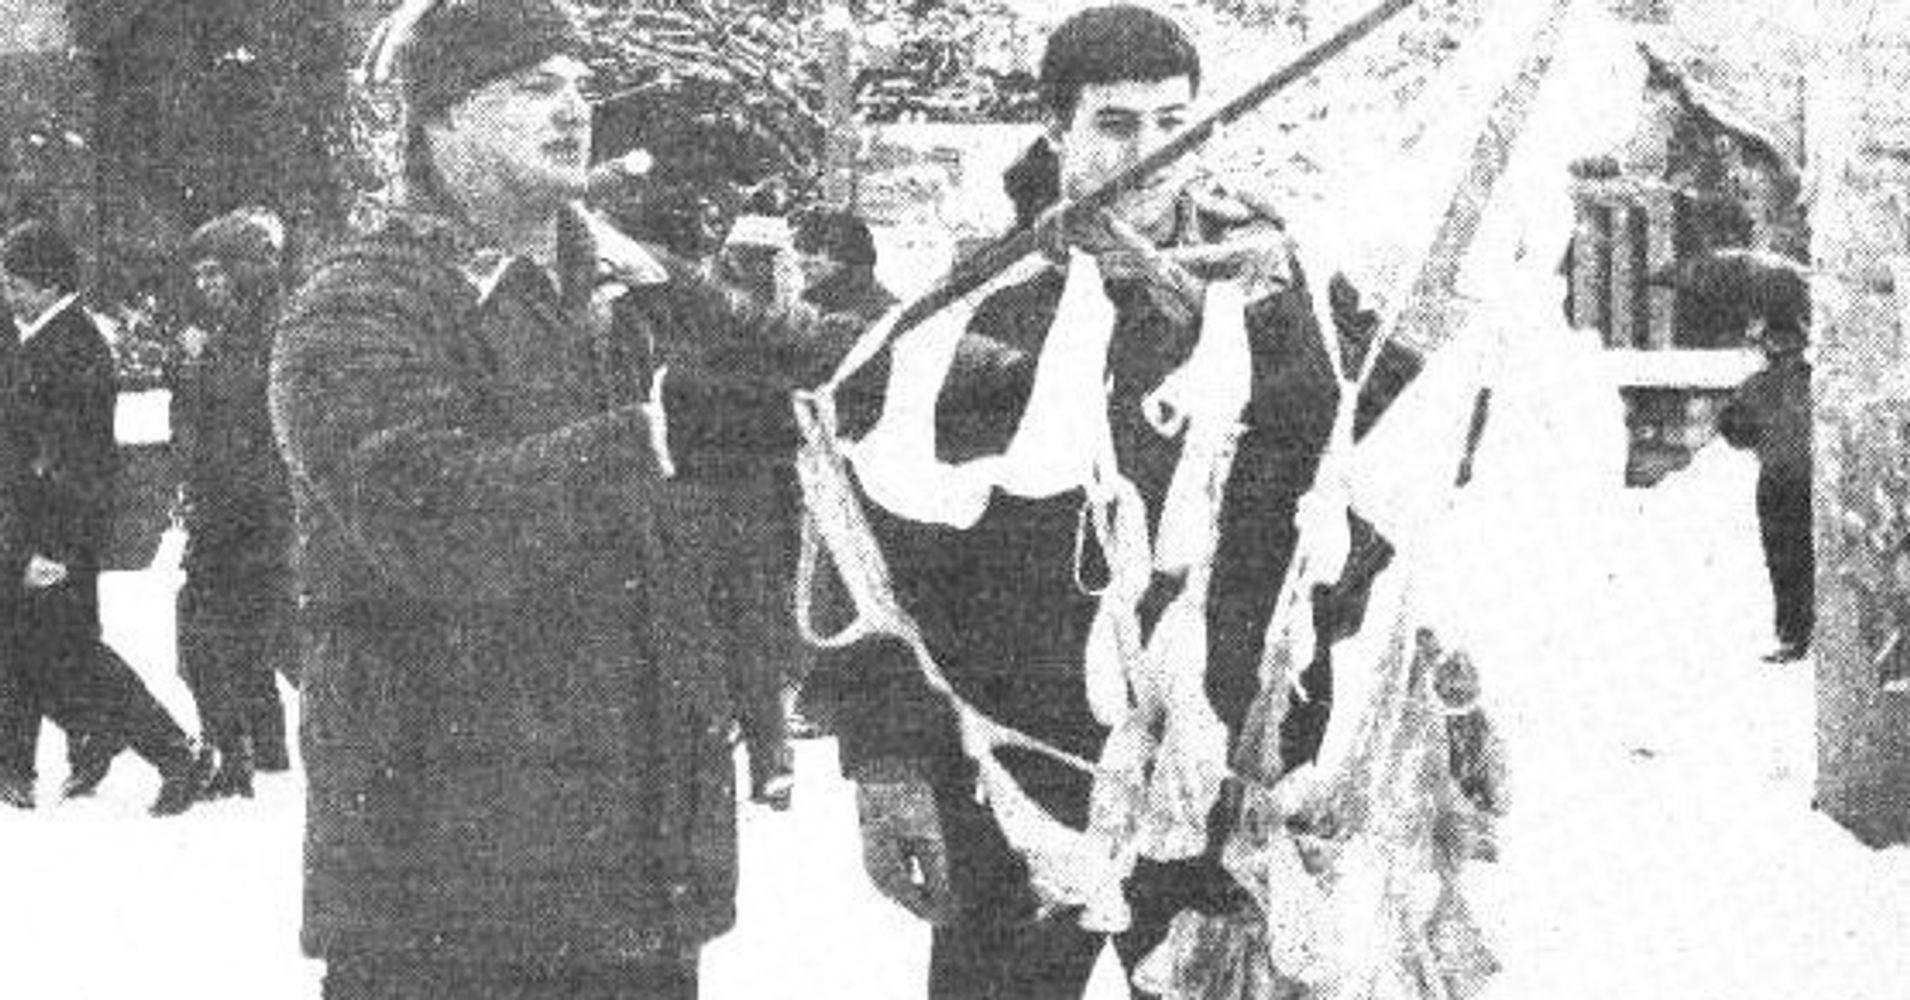 Brett Kavanaugh's Yale Fraternity Hoisted A Flag Made Of Women's Underwear In 1985 | HuffPost